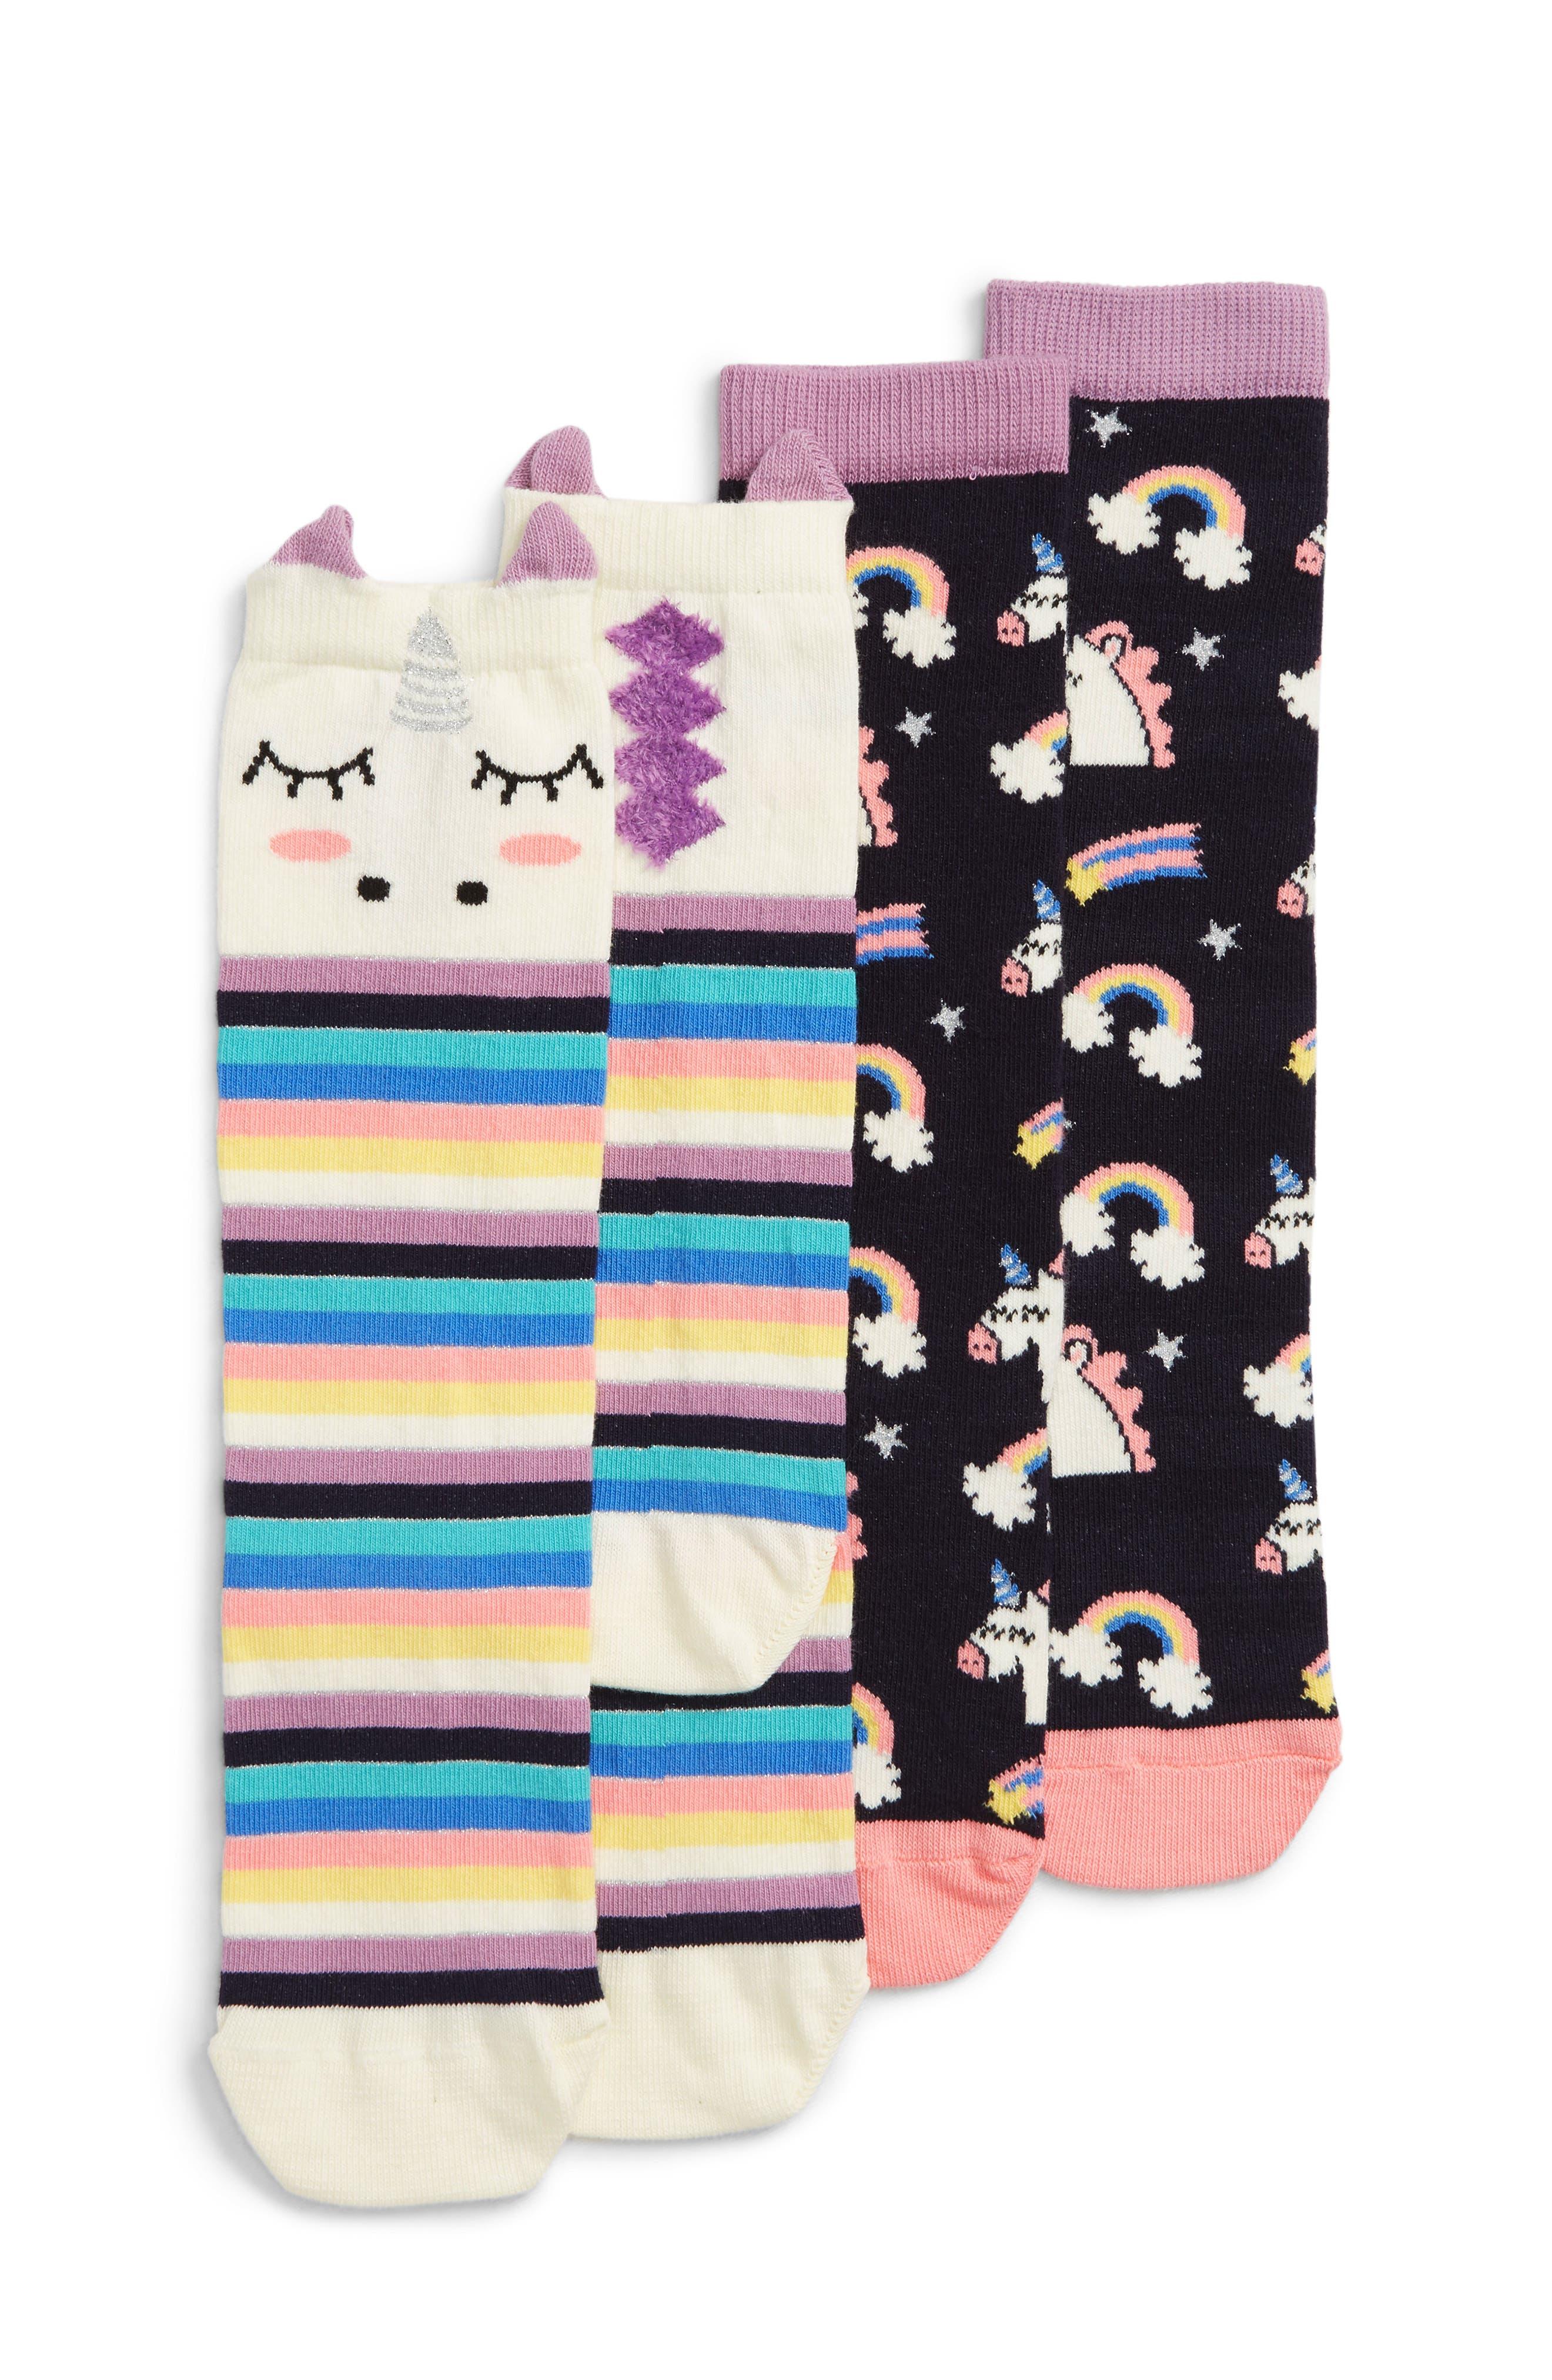 2-Pack Rainbows & Unicorns Knee High Socks,                             Main thumbnail 1, color,                             101